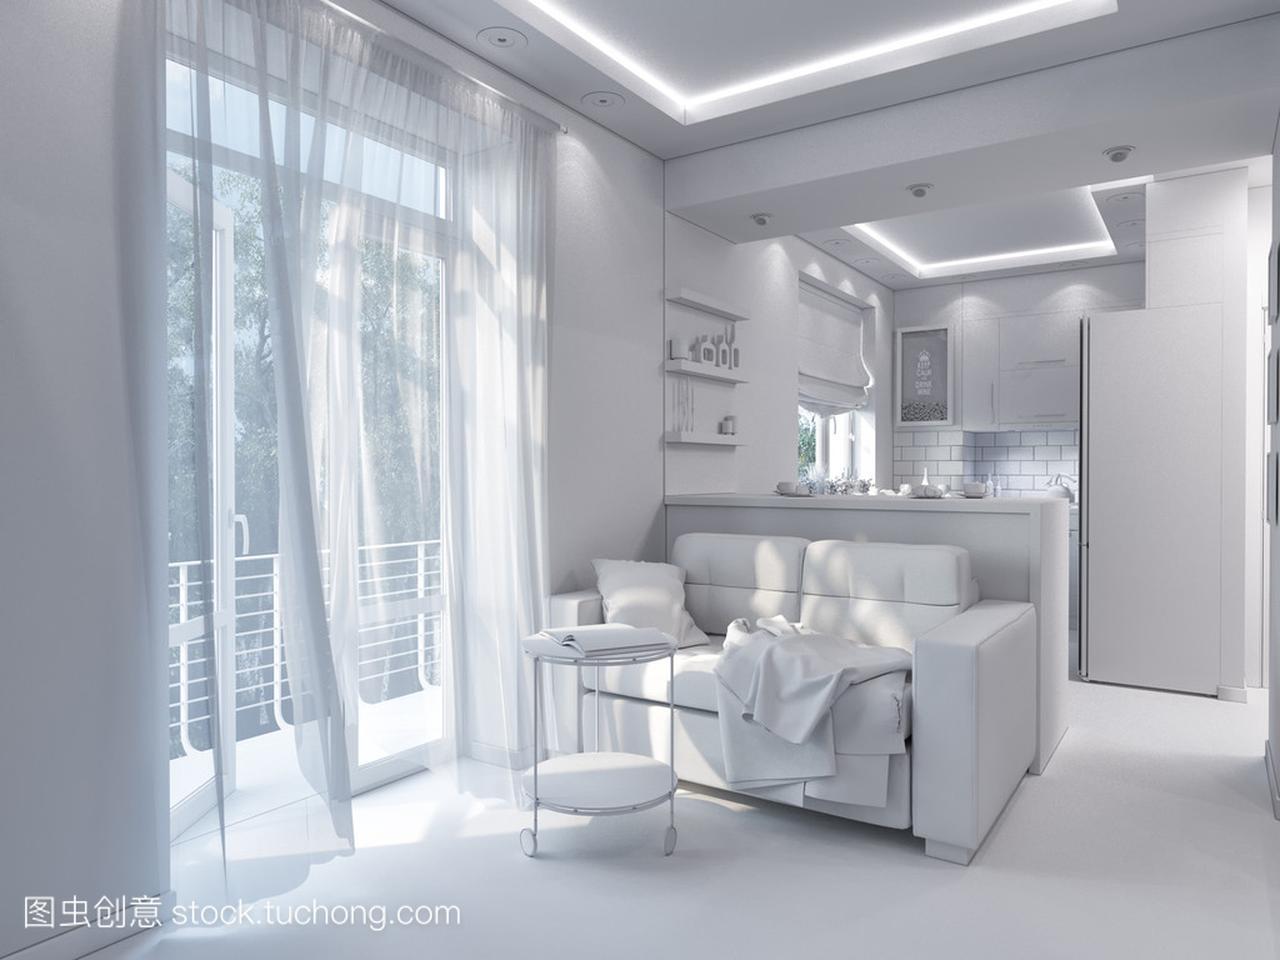 3d渲染梧桐室内设计浩创客厅单位景观设计花语图片